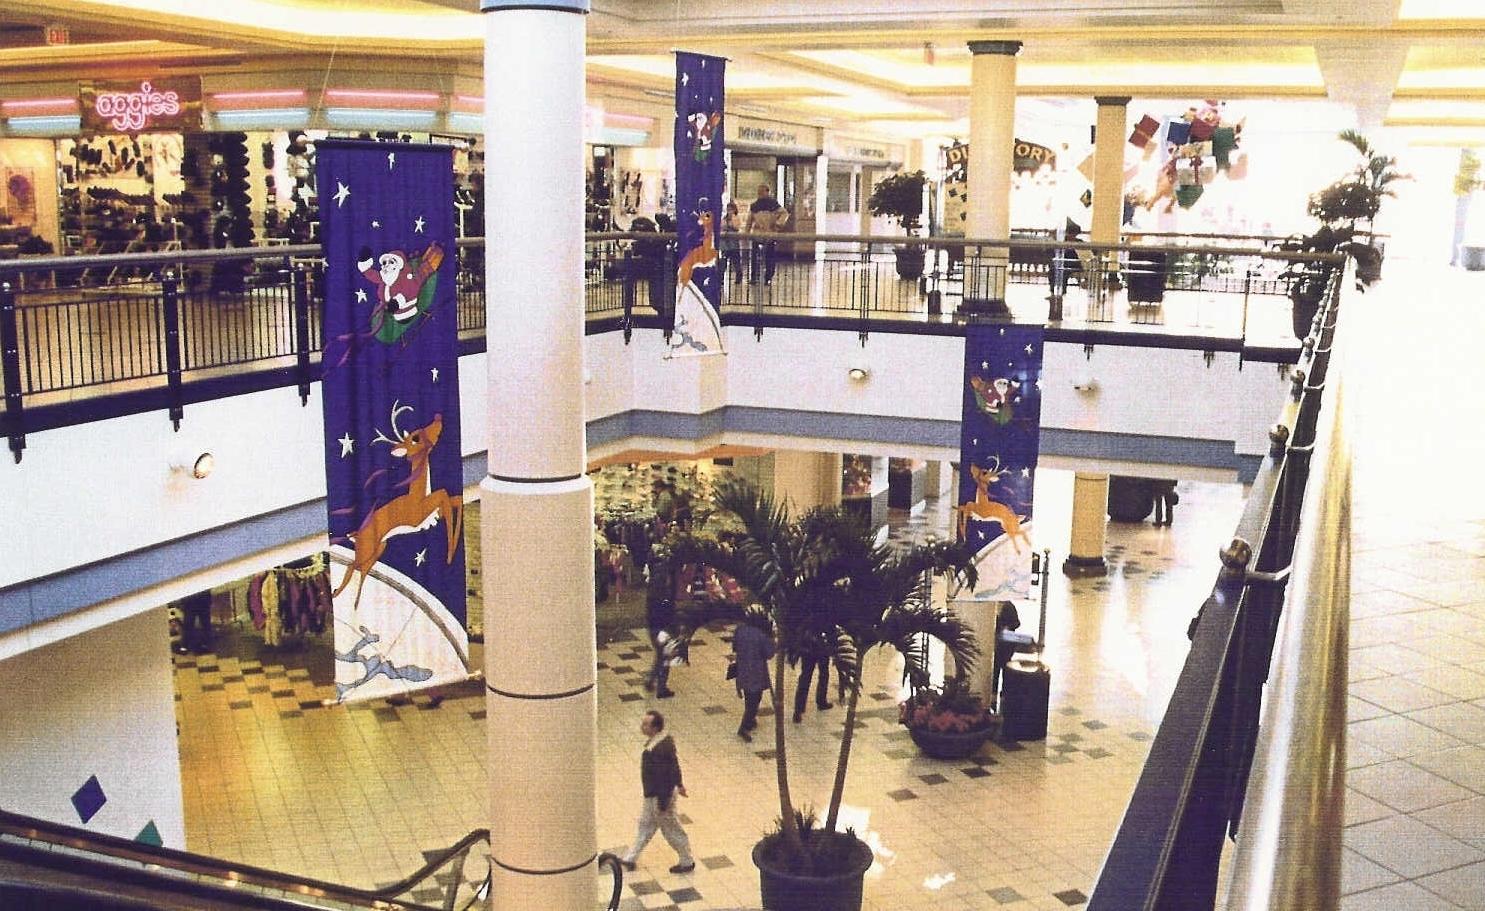 Londonderry Mall after reno 3.jpg